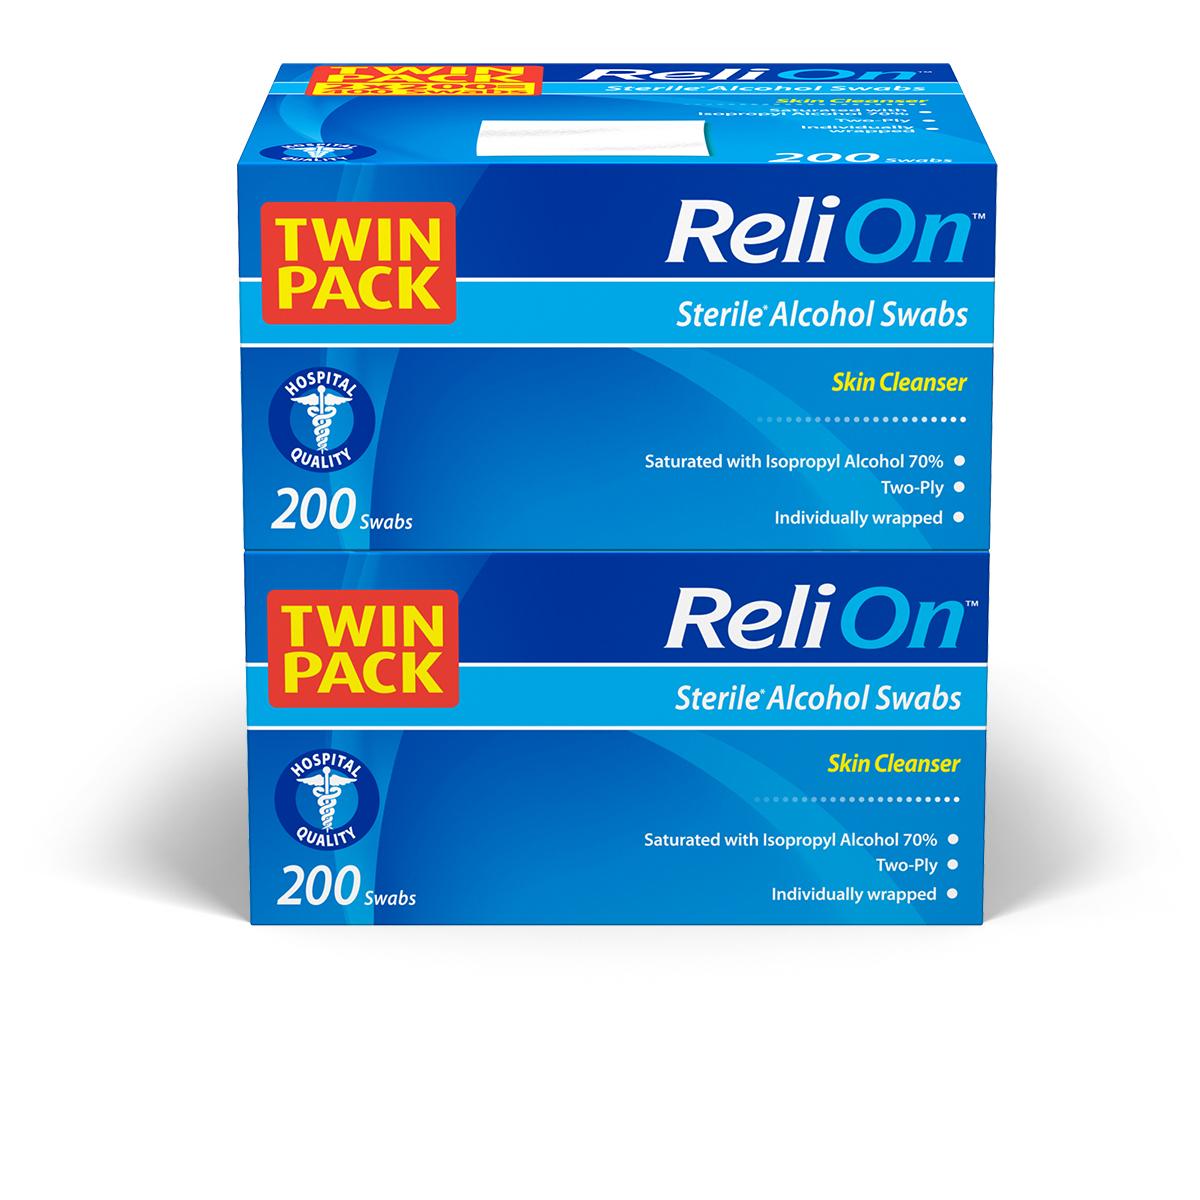 ReliOn Medium Isopropyl 70% Alcohol Prep Pads, 2-Ply, 200 Swabs Per Box (400 Total Count) $3.74 Free Pickup (Walmart)